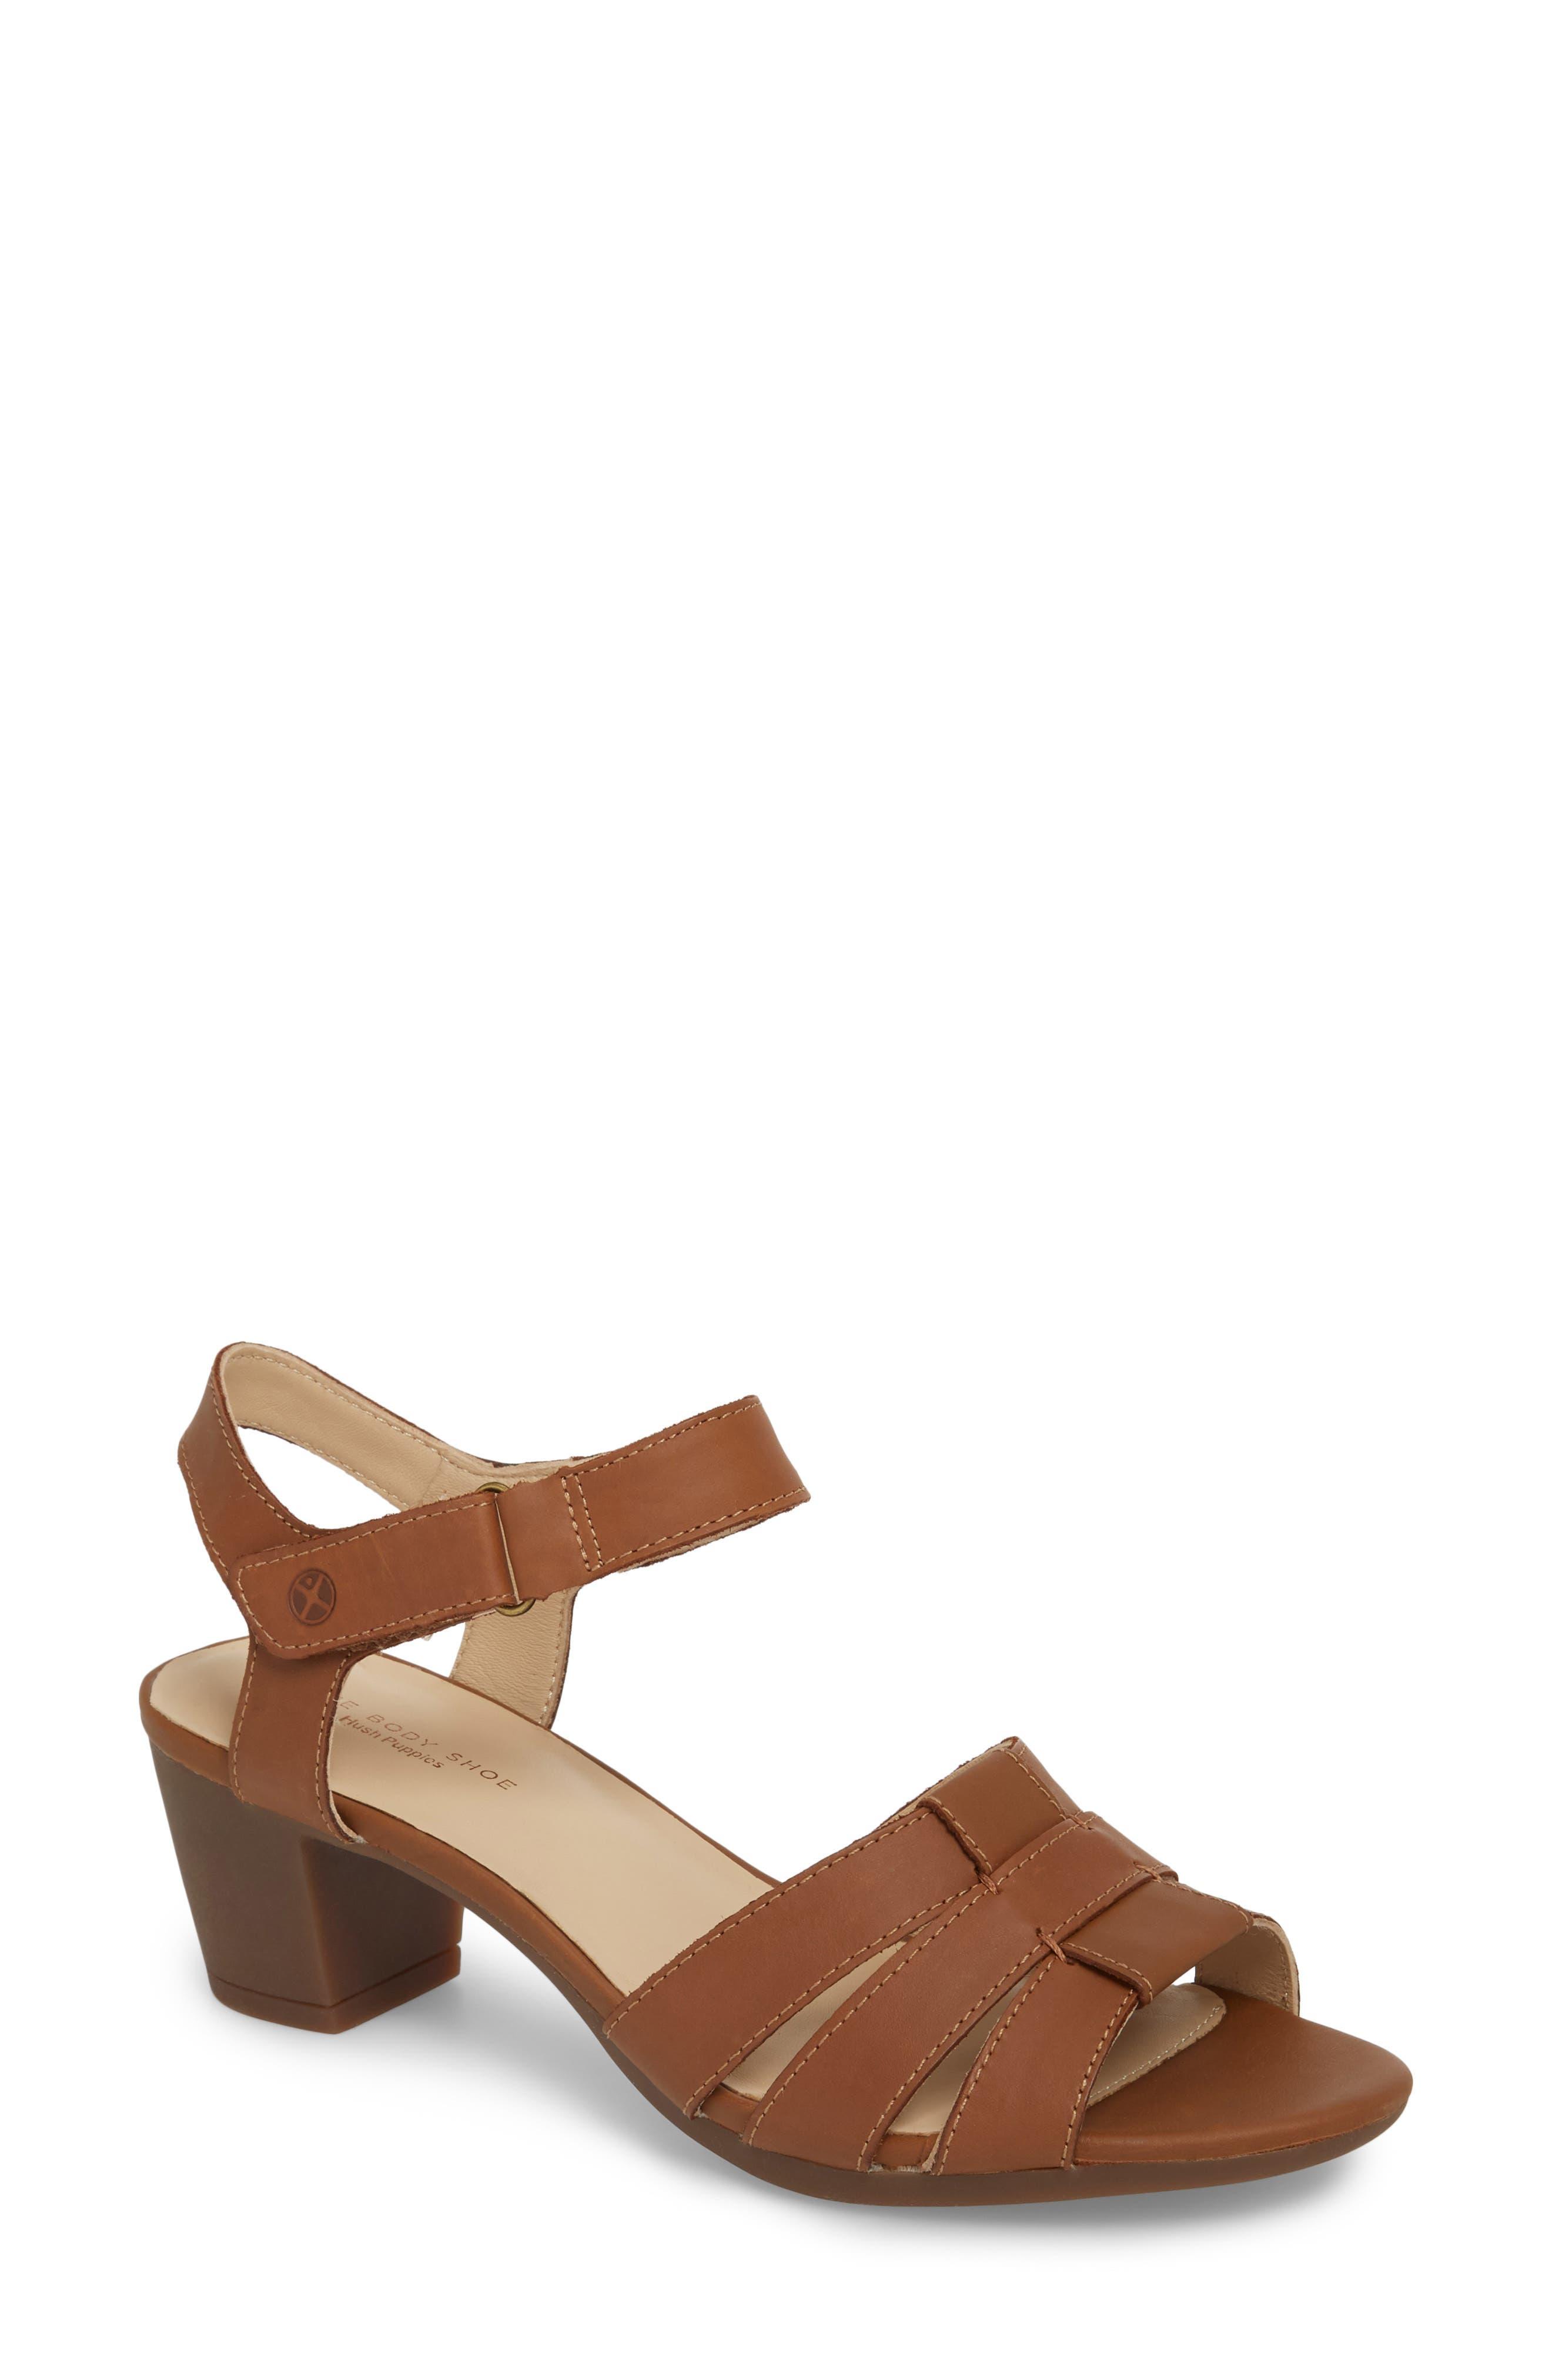 Masseter Quarter Strap Sandal,                         Main,                         color, Tan Leather